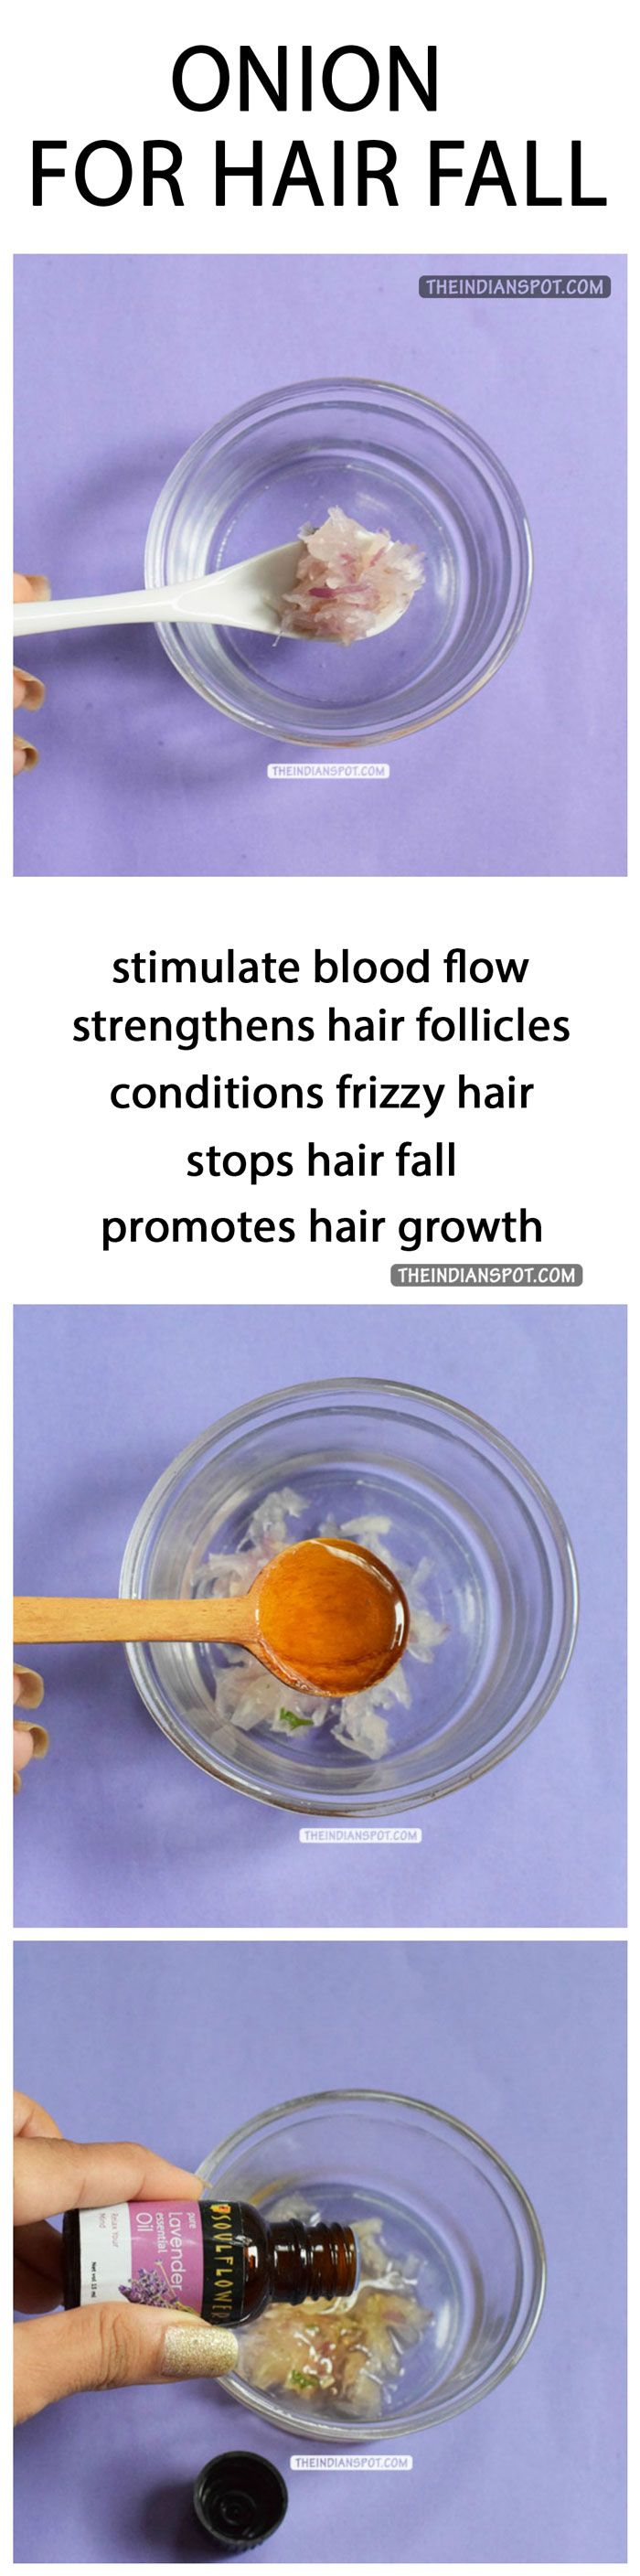 ideal diy hair mask for natural hair clues the haircut community